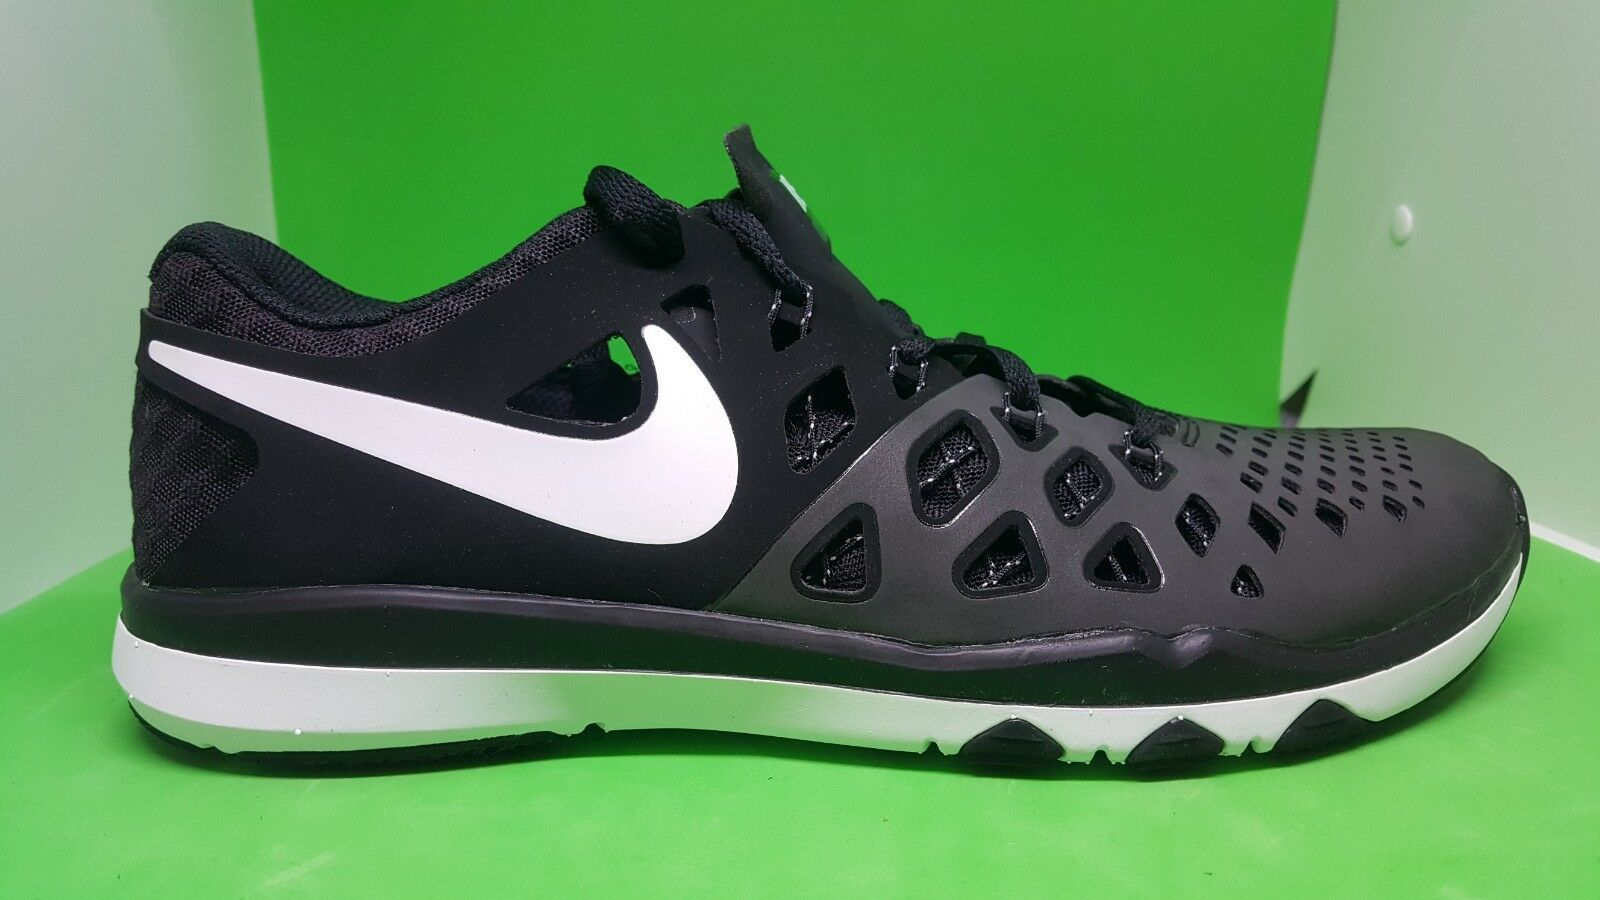 Nike Train Speed 4 Black White 843937-009 Men's Cross Training Gym Shoes